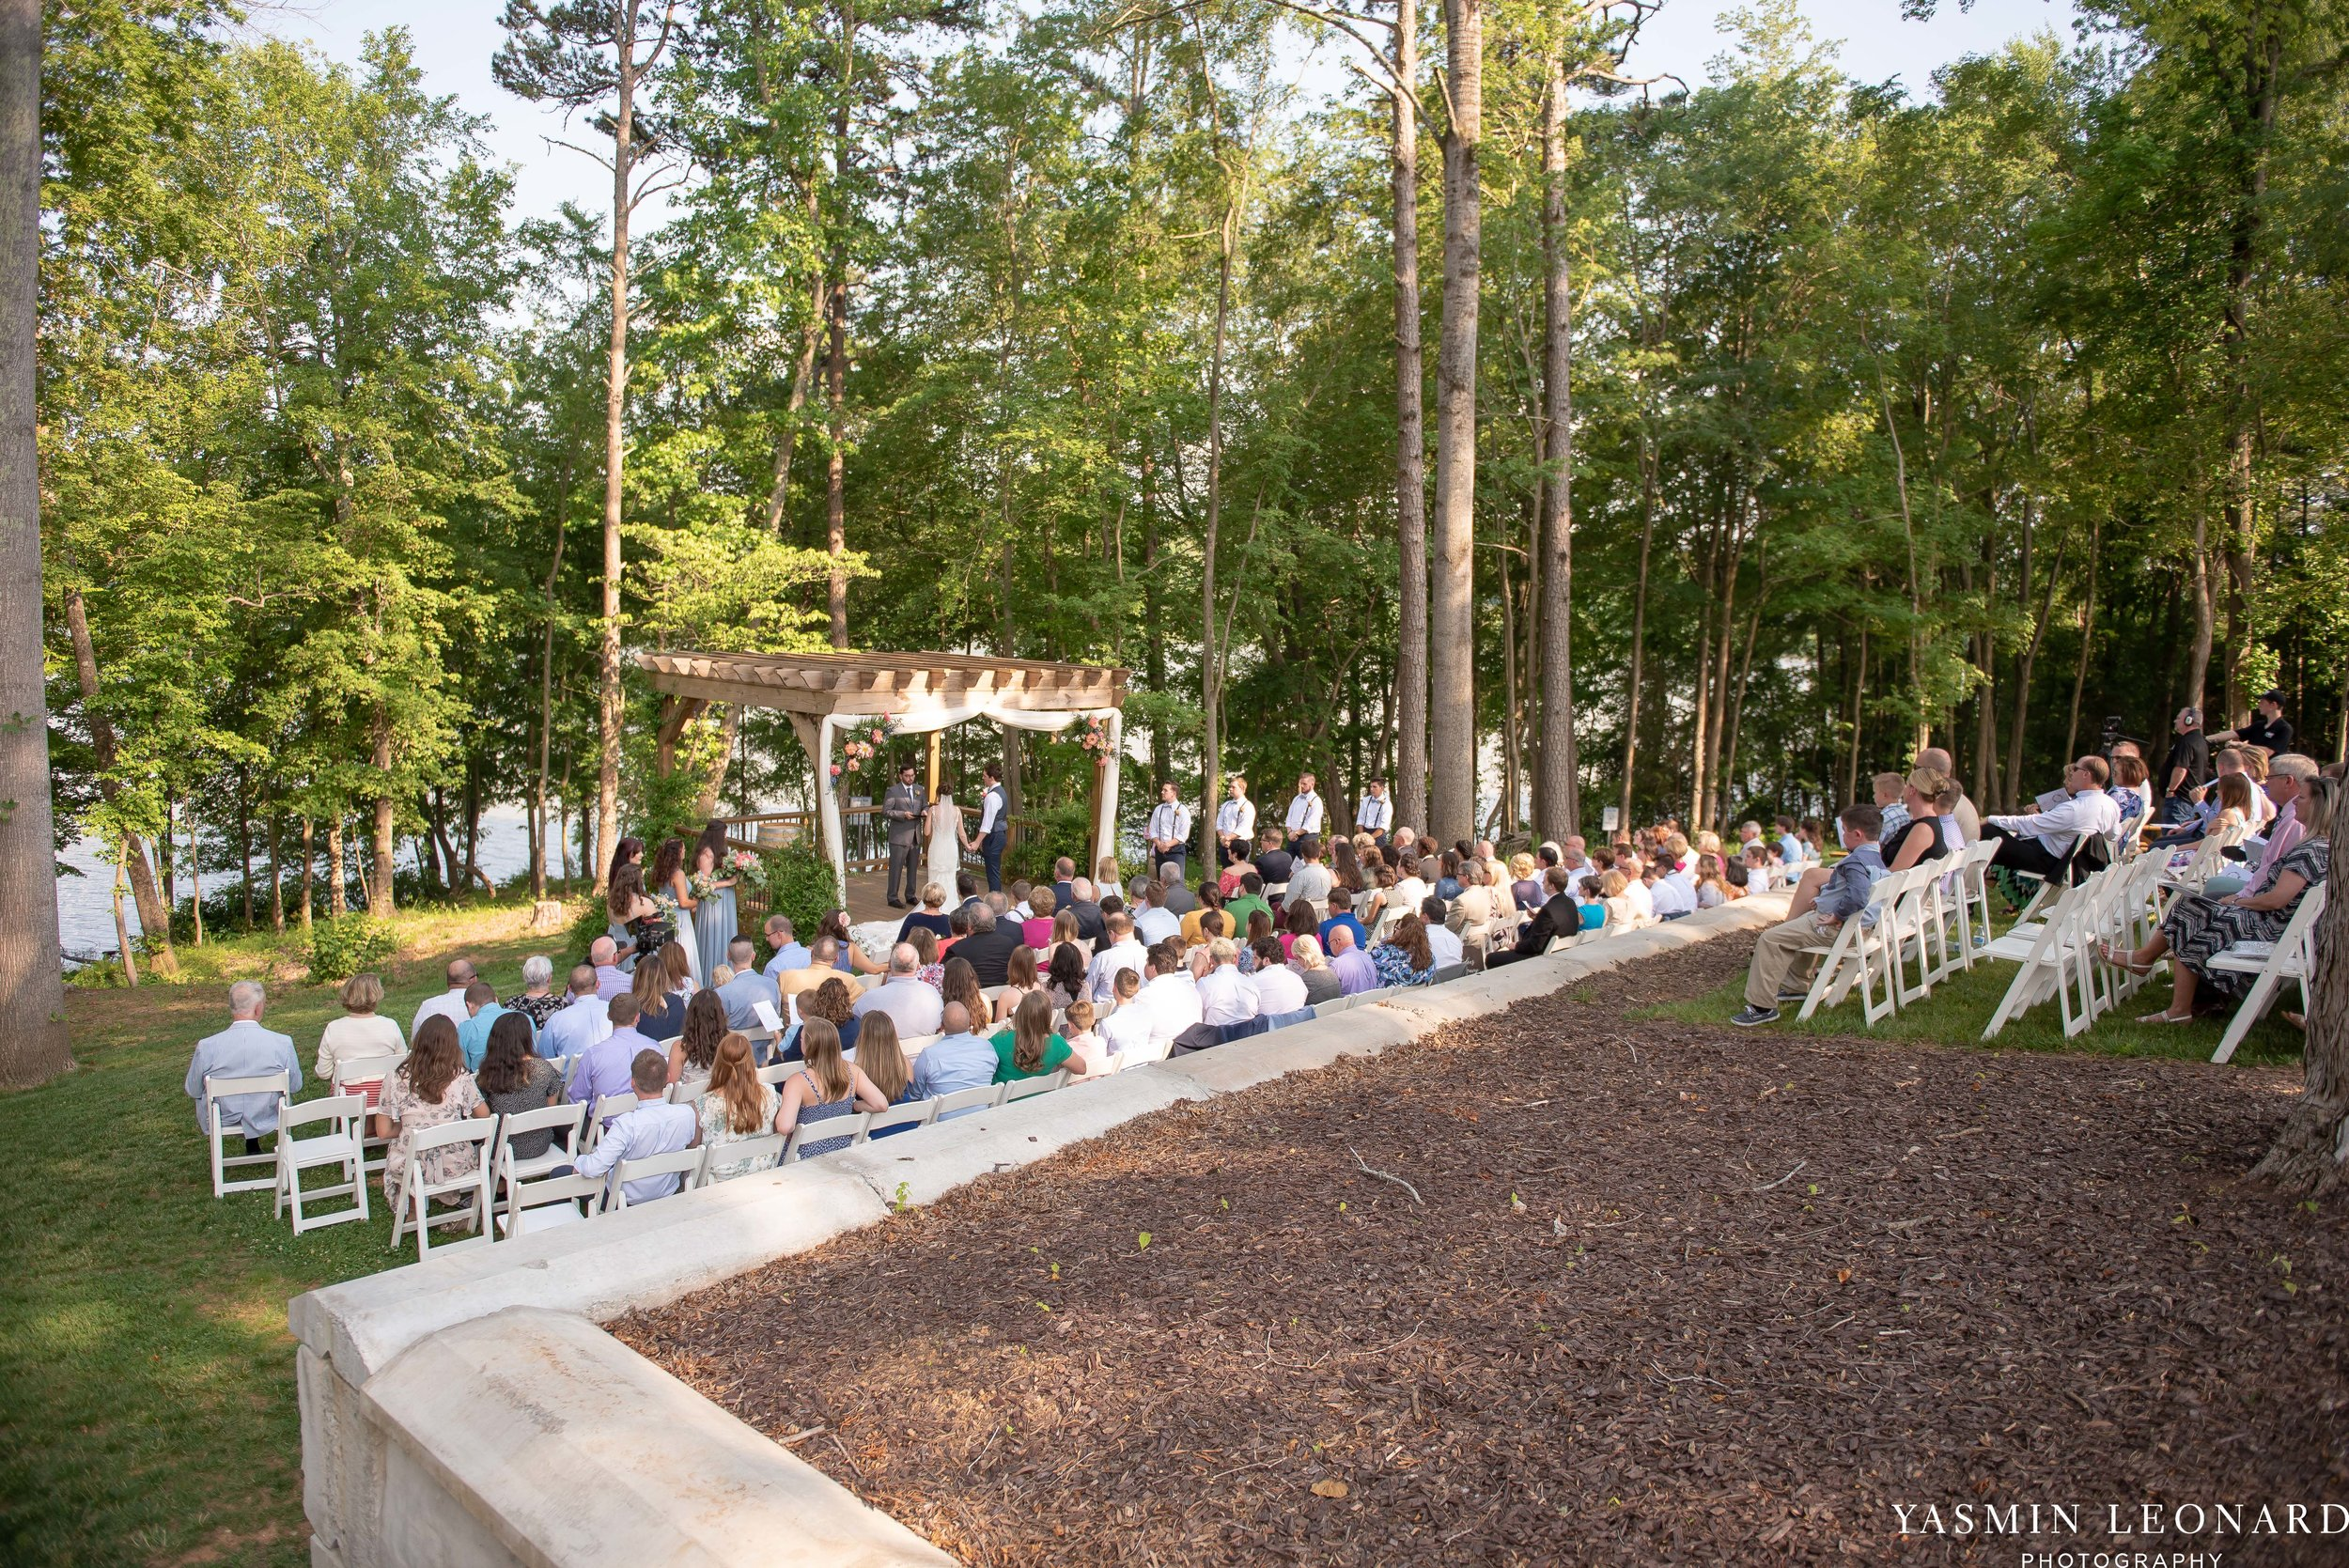 Old Homeplace Vineyard - NC Weddings - Outdoor Summer Weddings - Peony Boutique - Vineyard Wedding - NC Photographer - Yasmin Leonard Photography-30.jpg